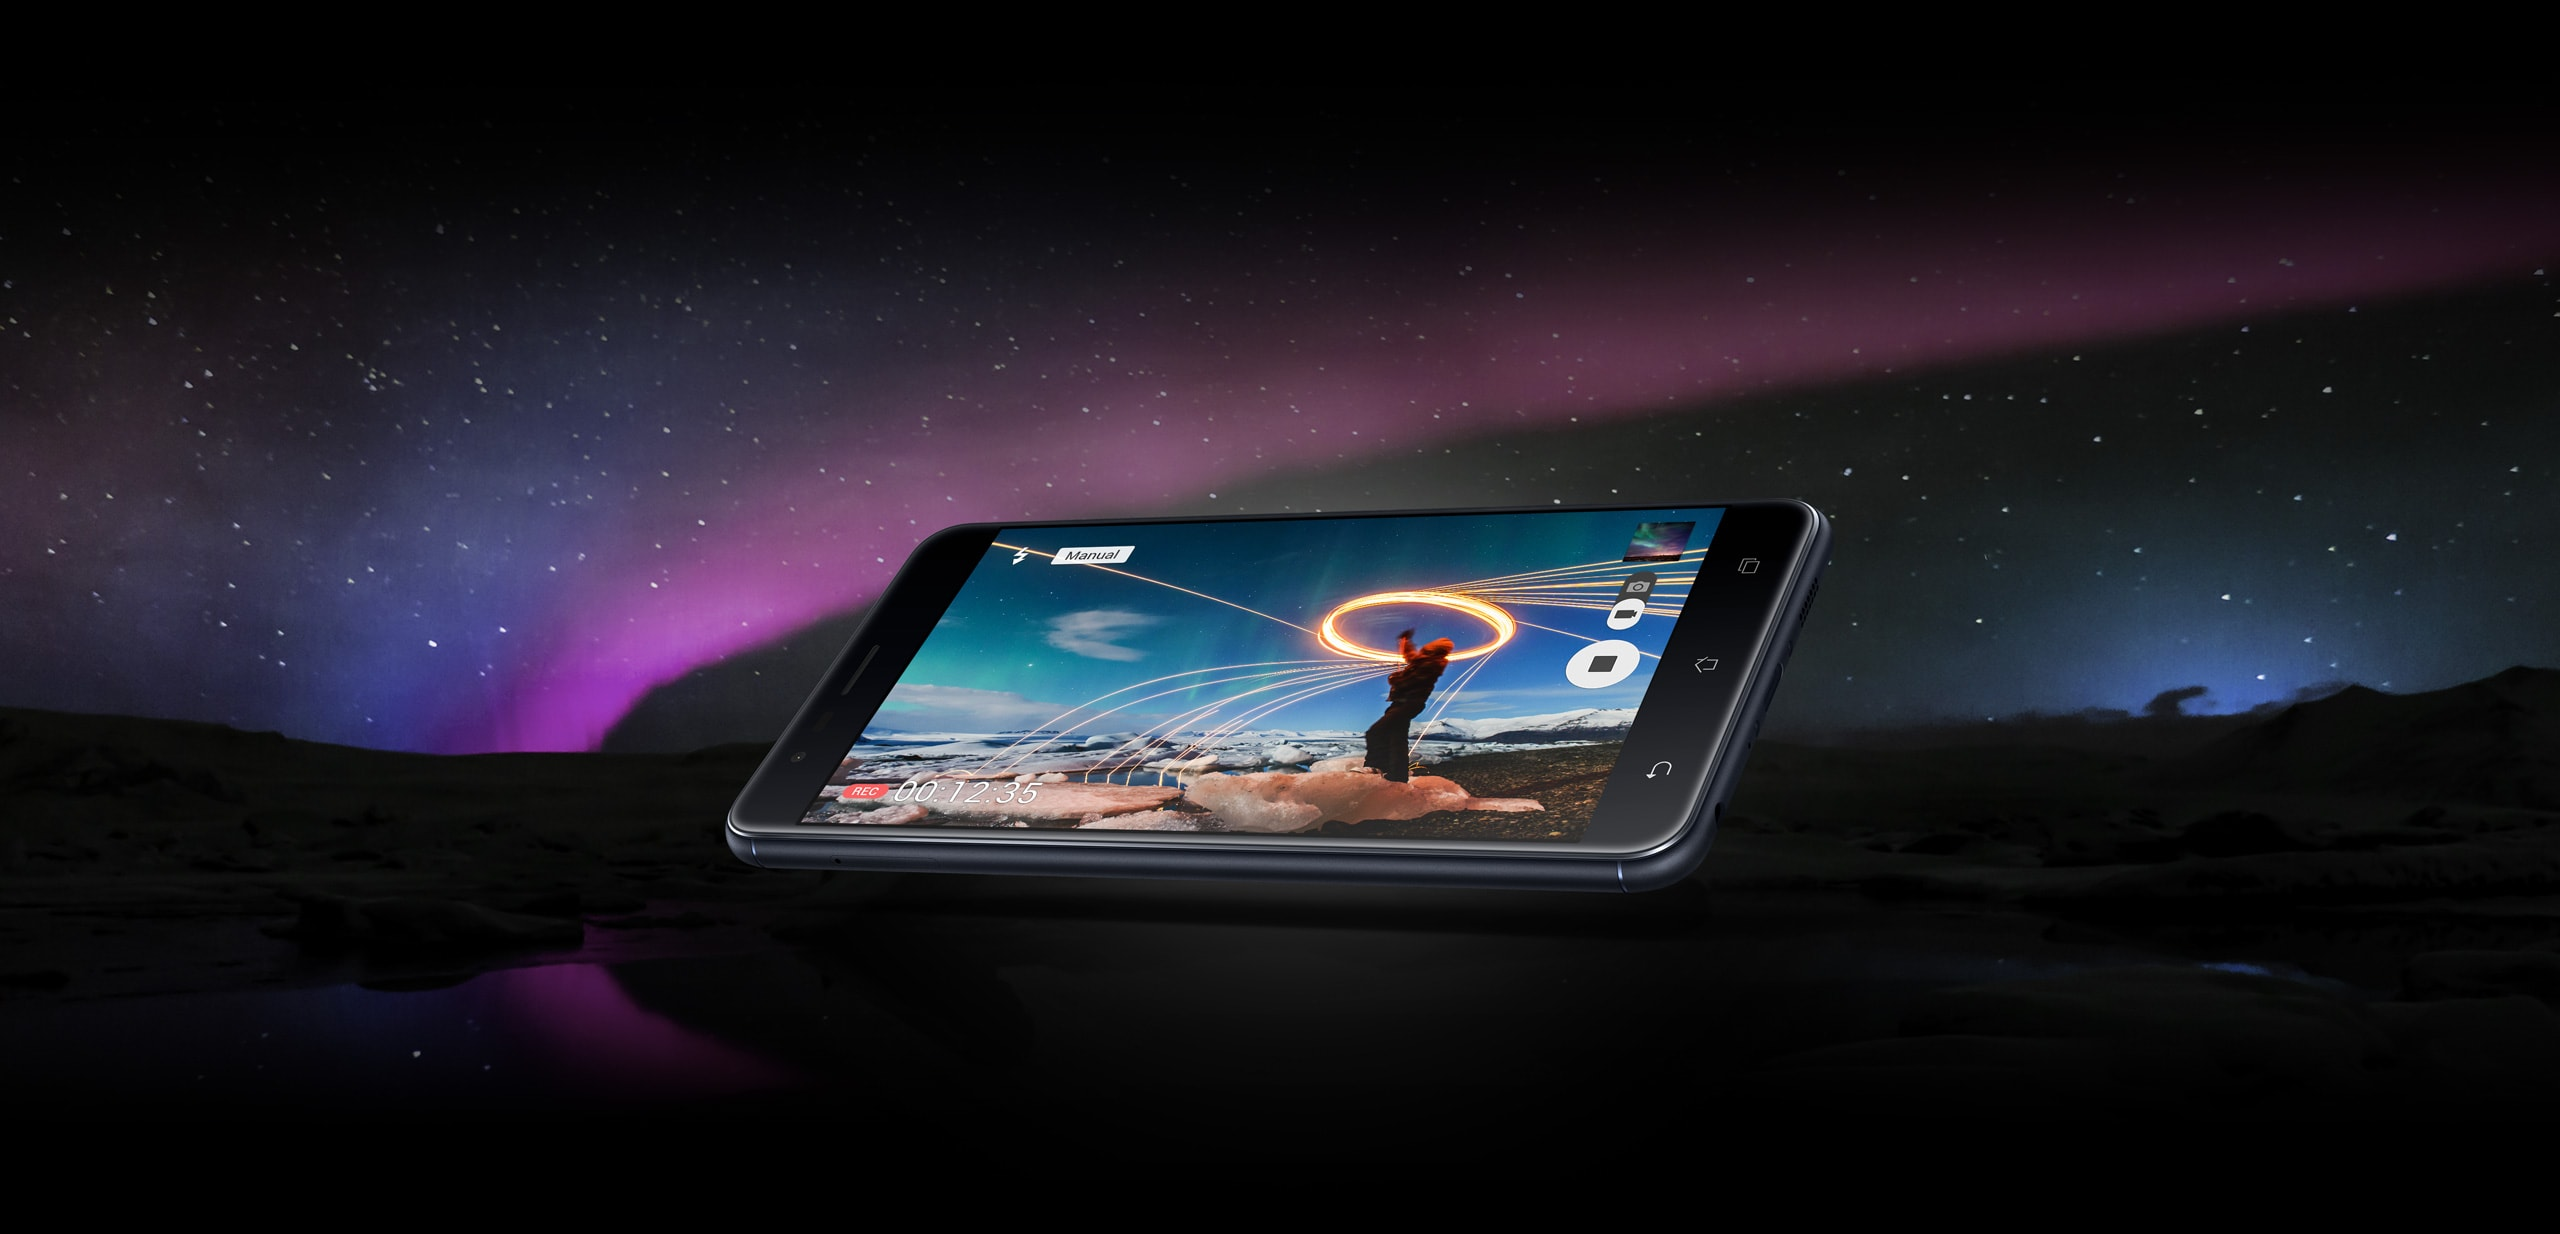 043c23ccb O ZenFone Zoom S é até capaz de se transformar num Powerbank, significando  que o pode usar para carregar outros dispositivos.